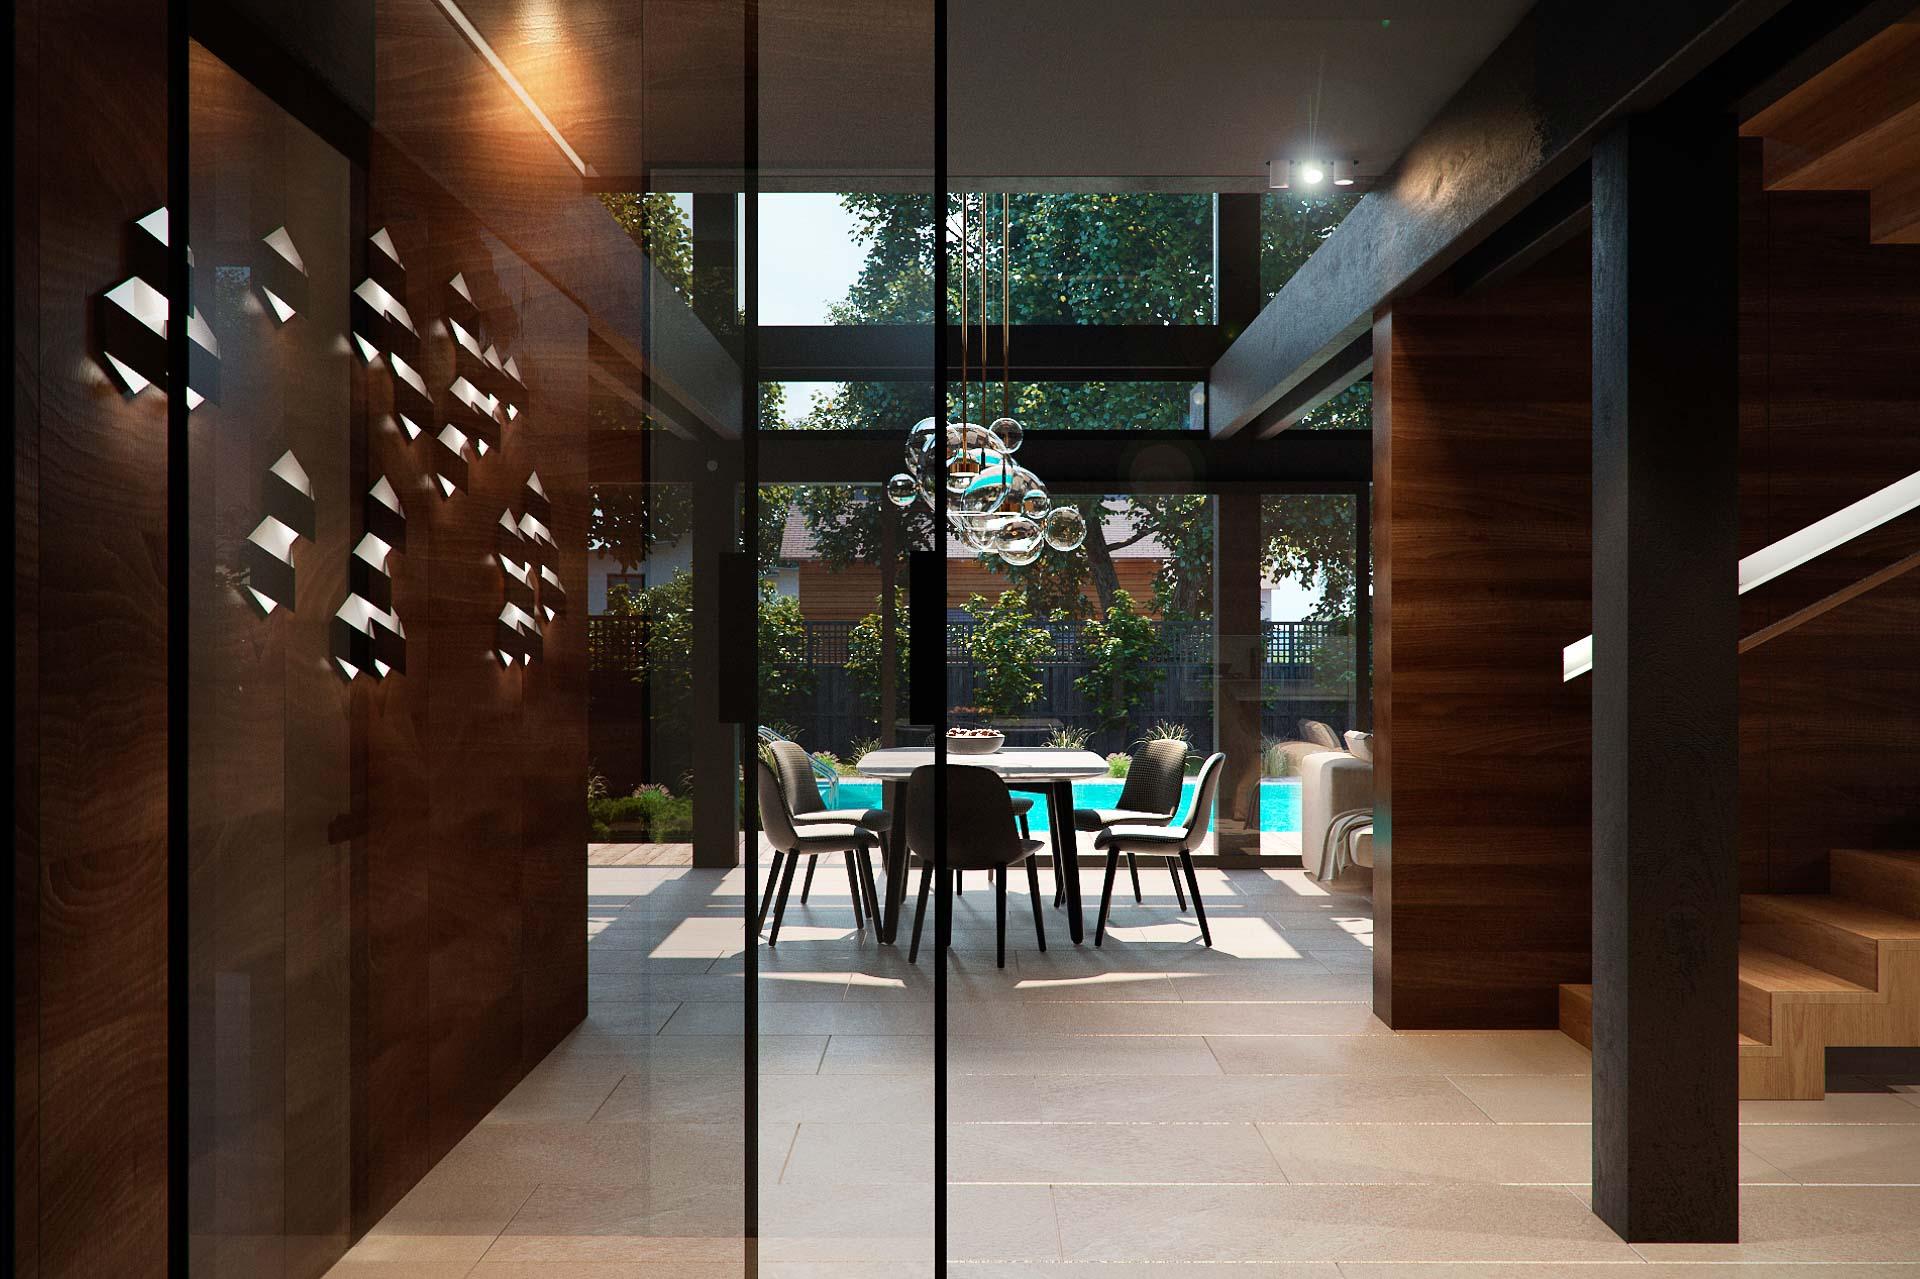 Hall interior design by lera bykova